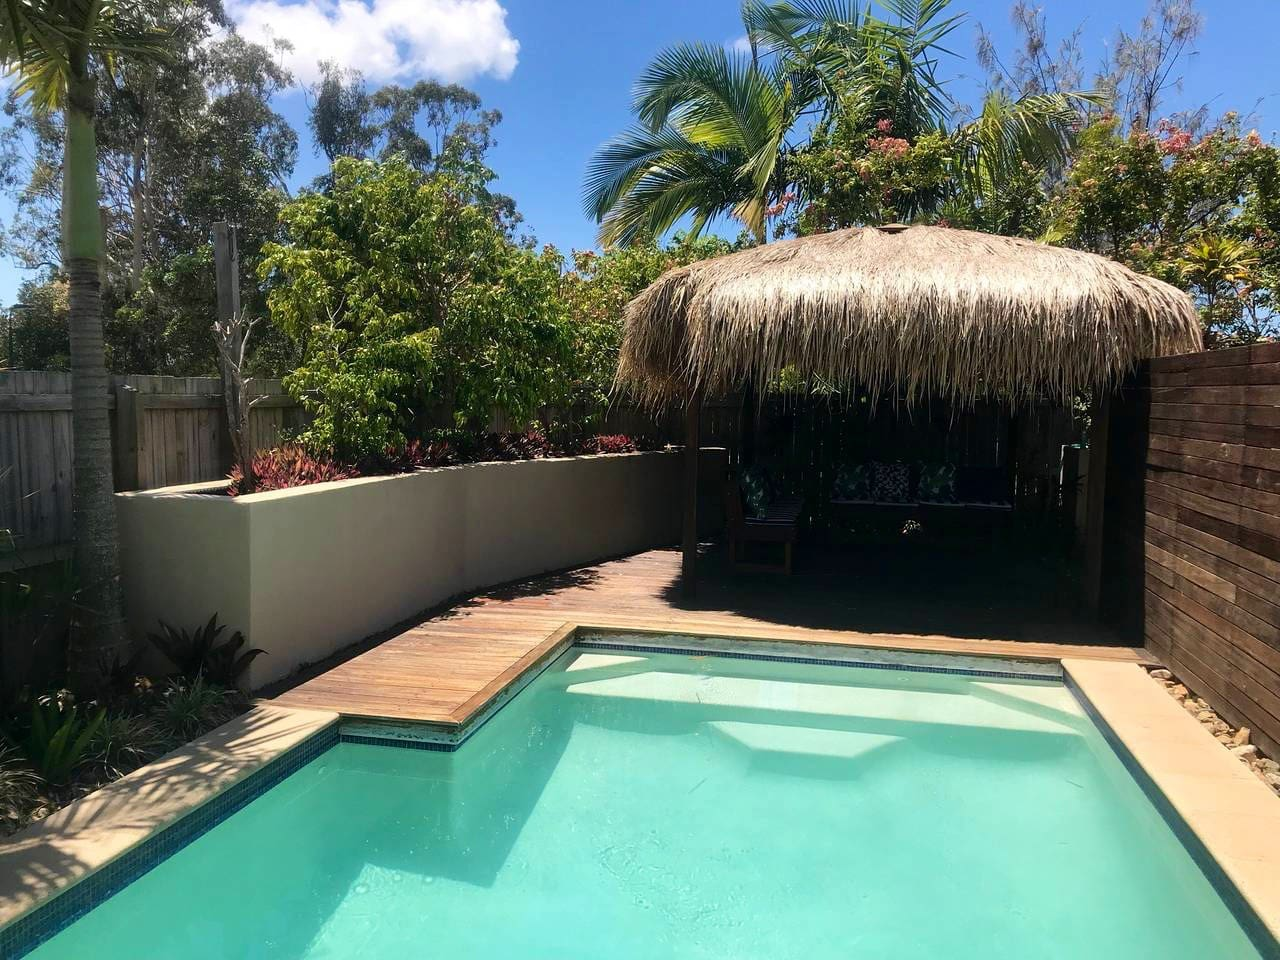 Pool and Bali hut